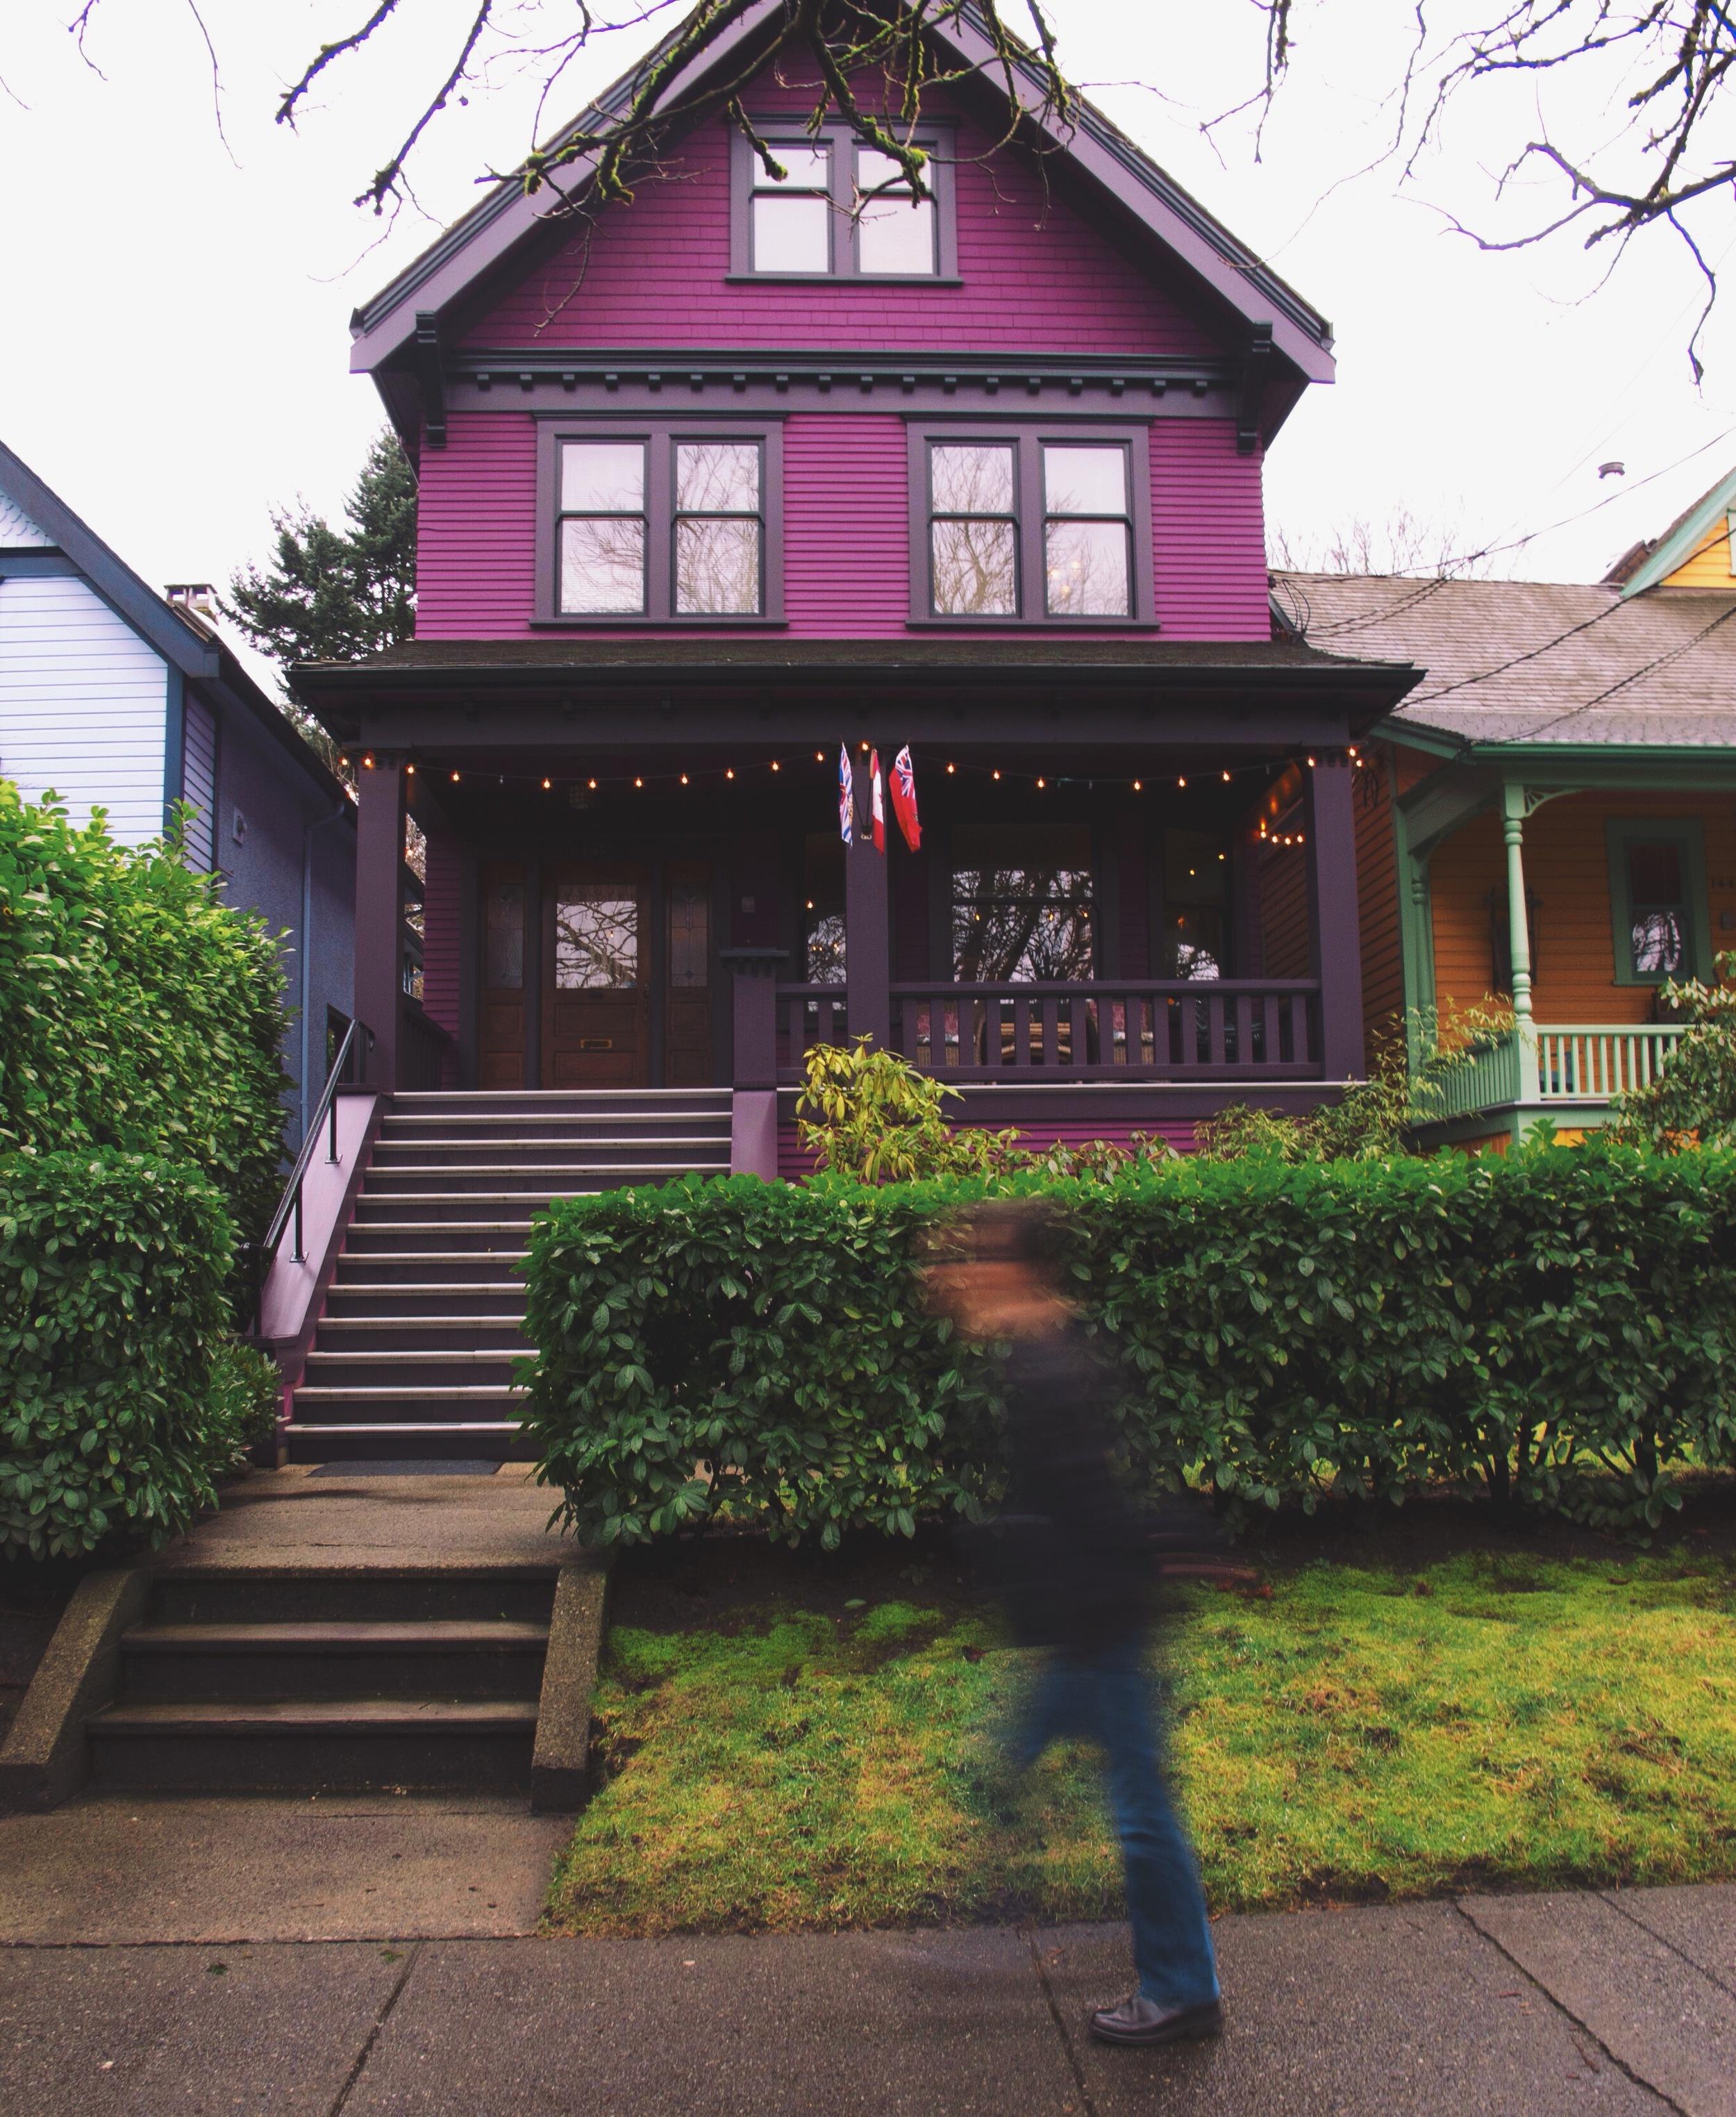 DAVIS HOUSES